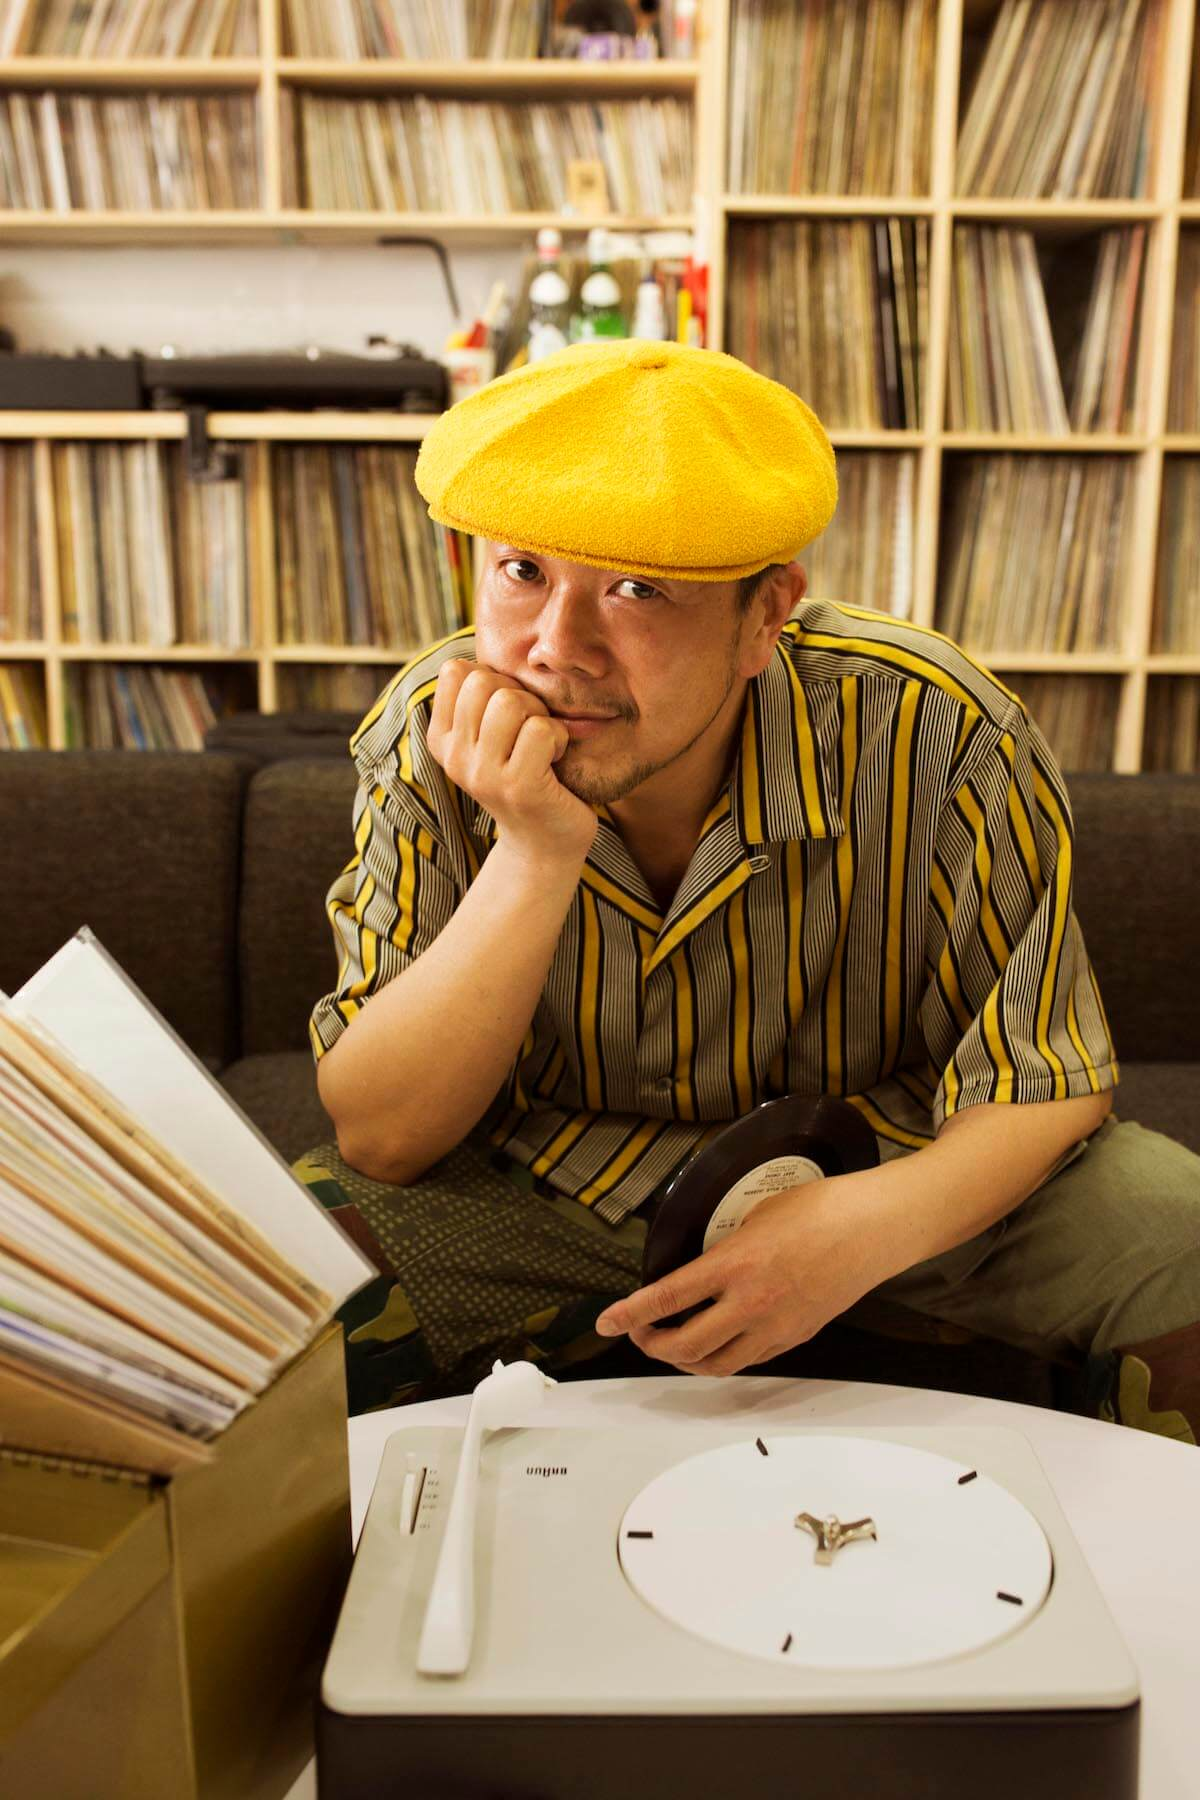 SL−1200MK7発売記念、DOMMUNEにてスペシャル番組配信決定 DJ KOCO A.K.A SHIMOKITA 、Mighty Crown、MUROら出演 lifefashion190603technics-dommune_MURO